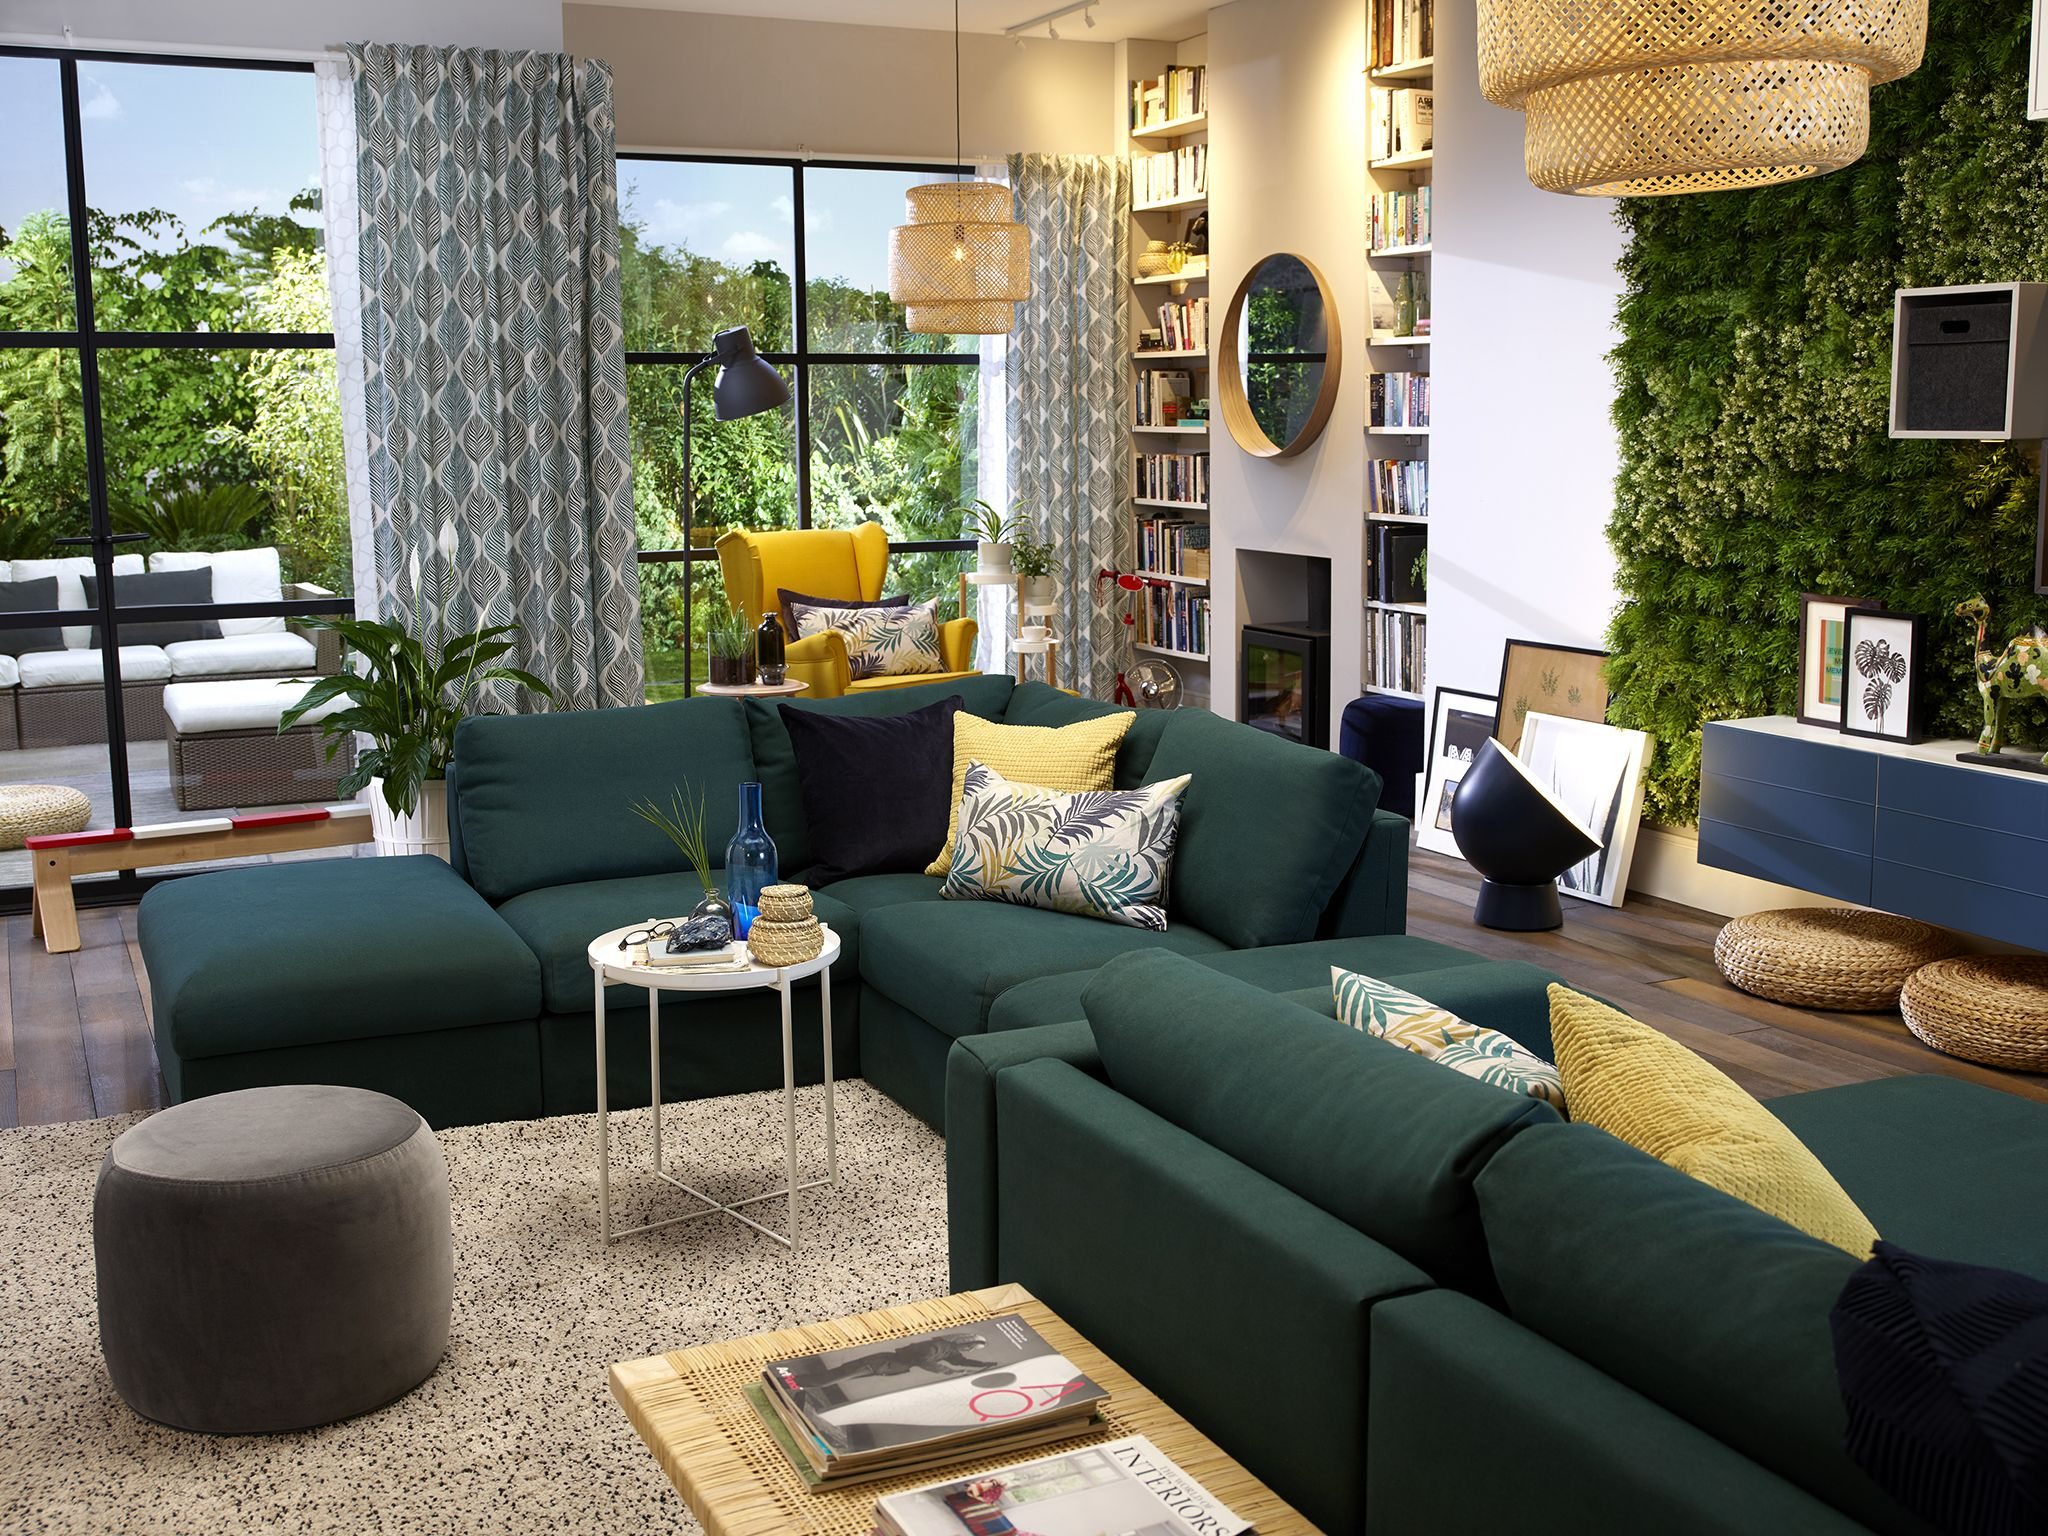 Image Result For Ikea Vimle Sofa Green Living Room